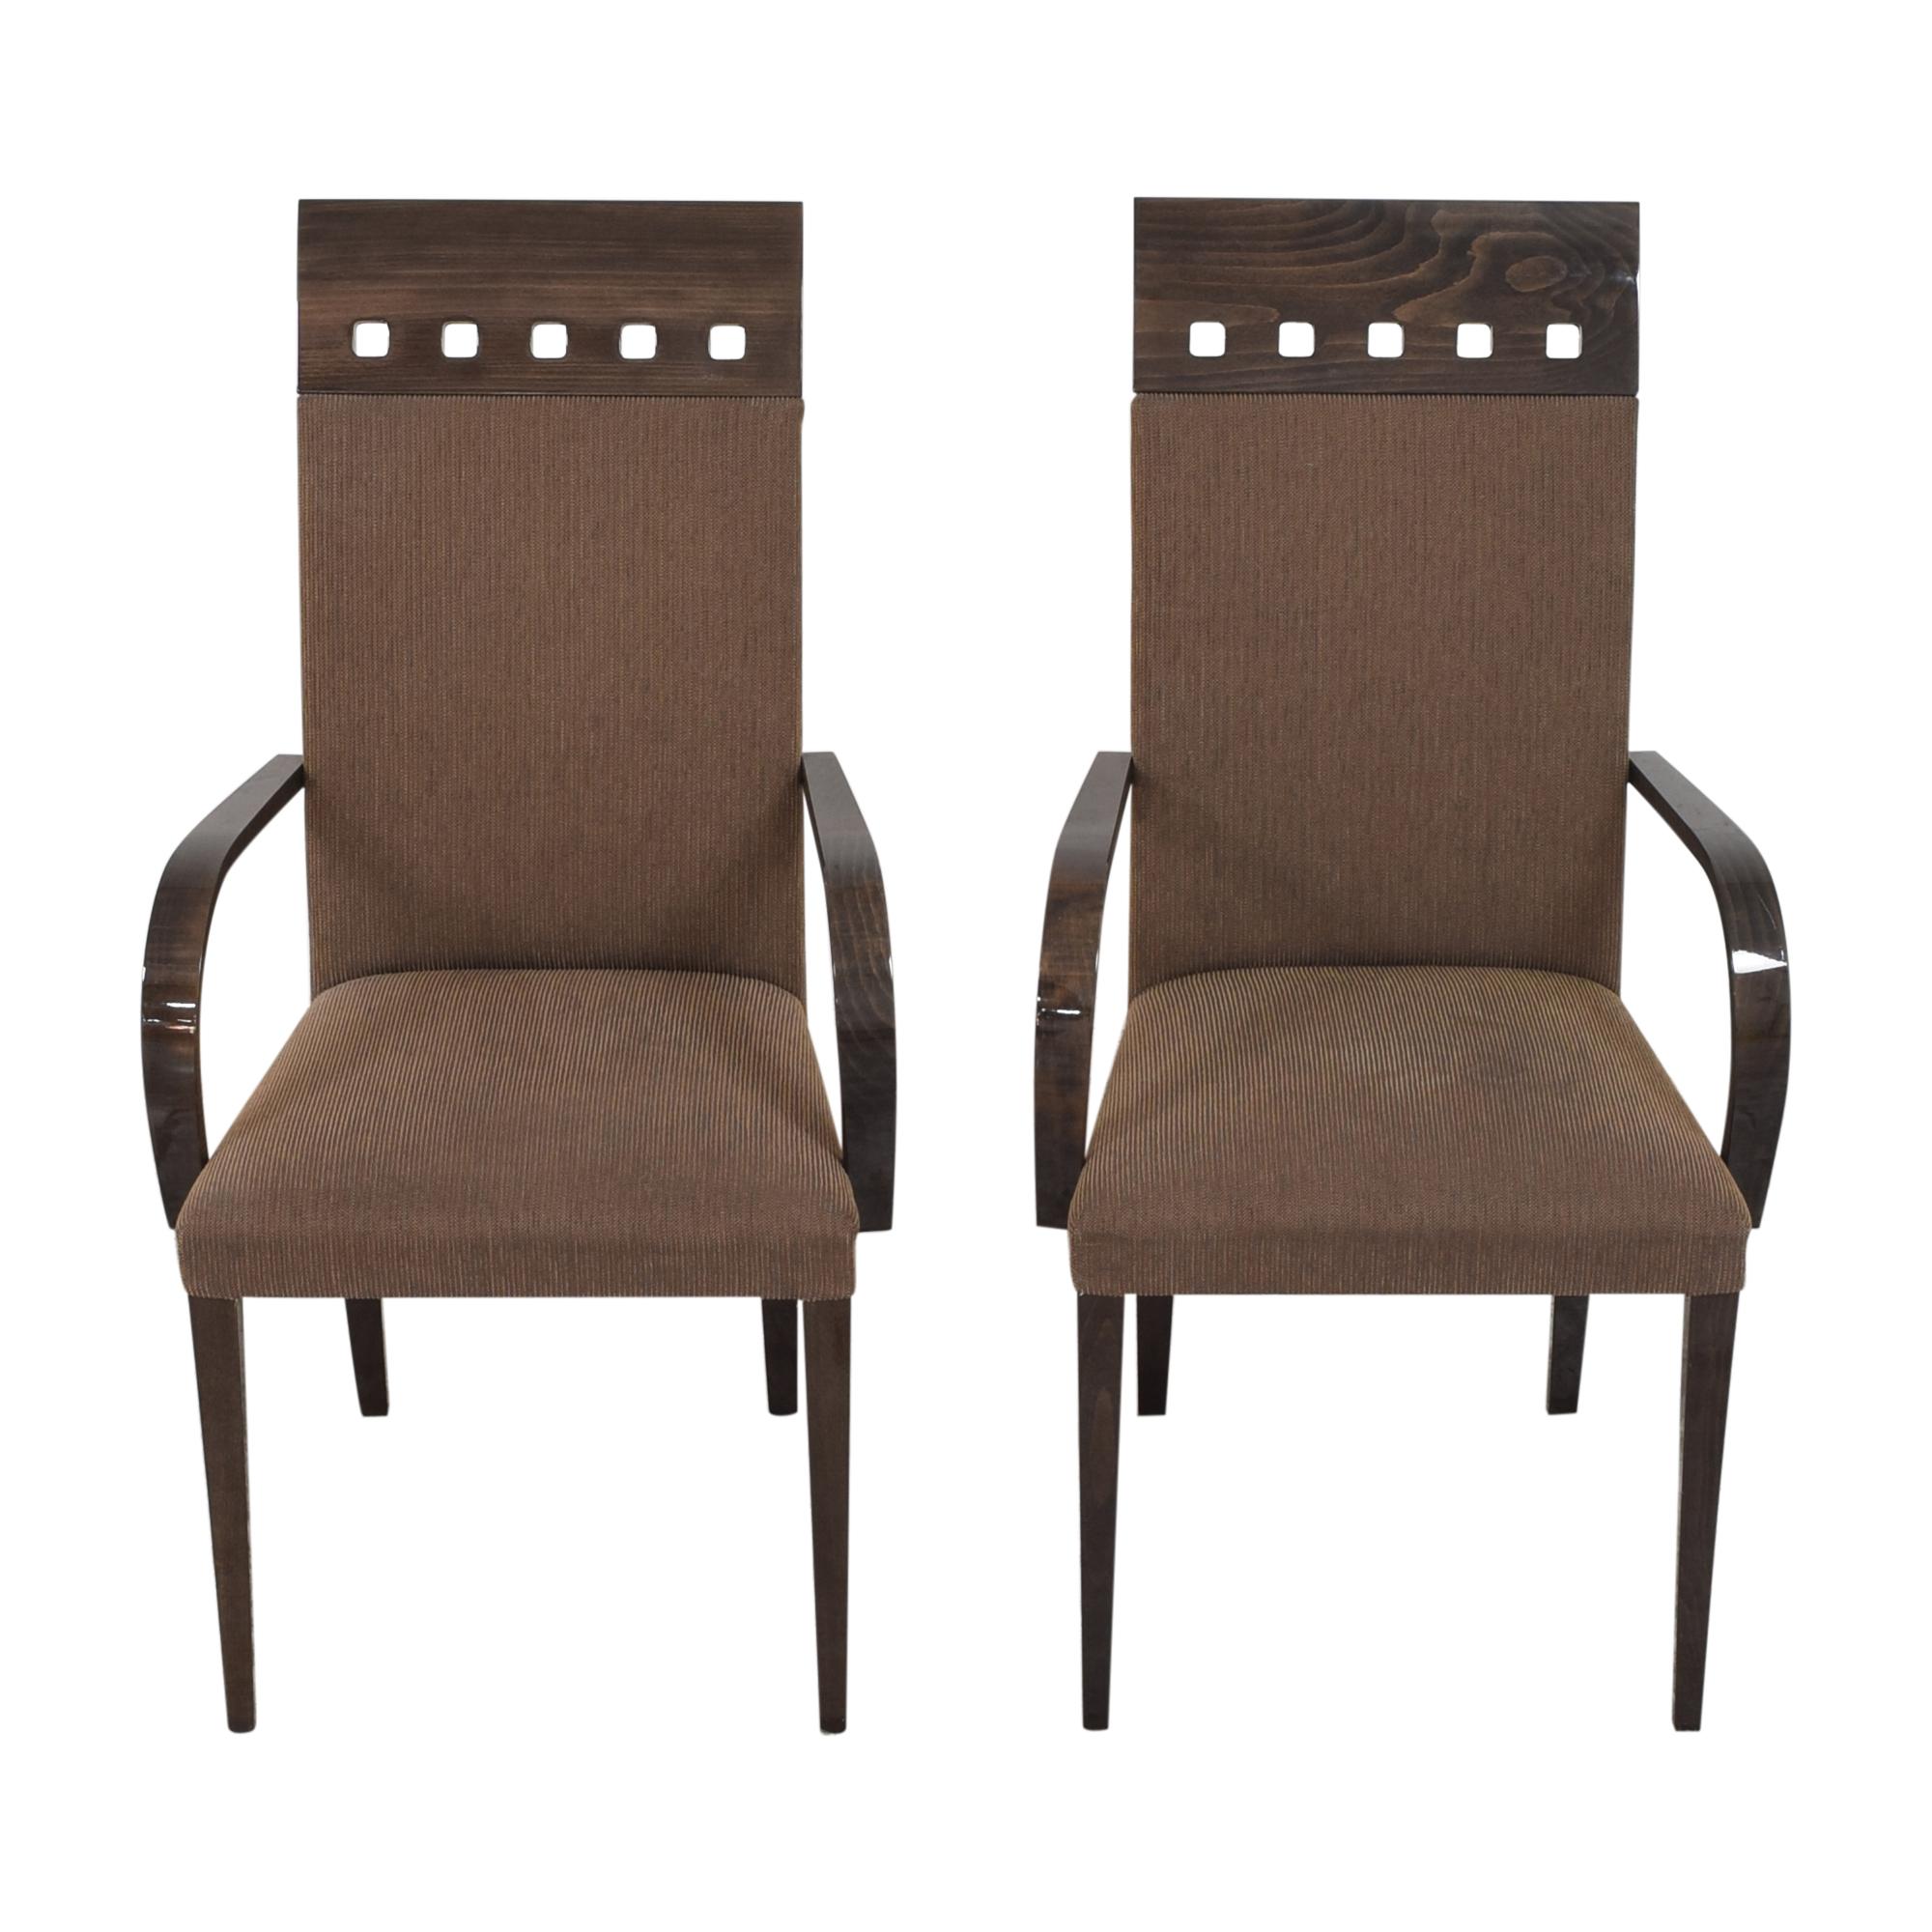 Pietro Costantini Pietro Costantini High Back Dining Arm Chairs nyc